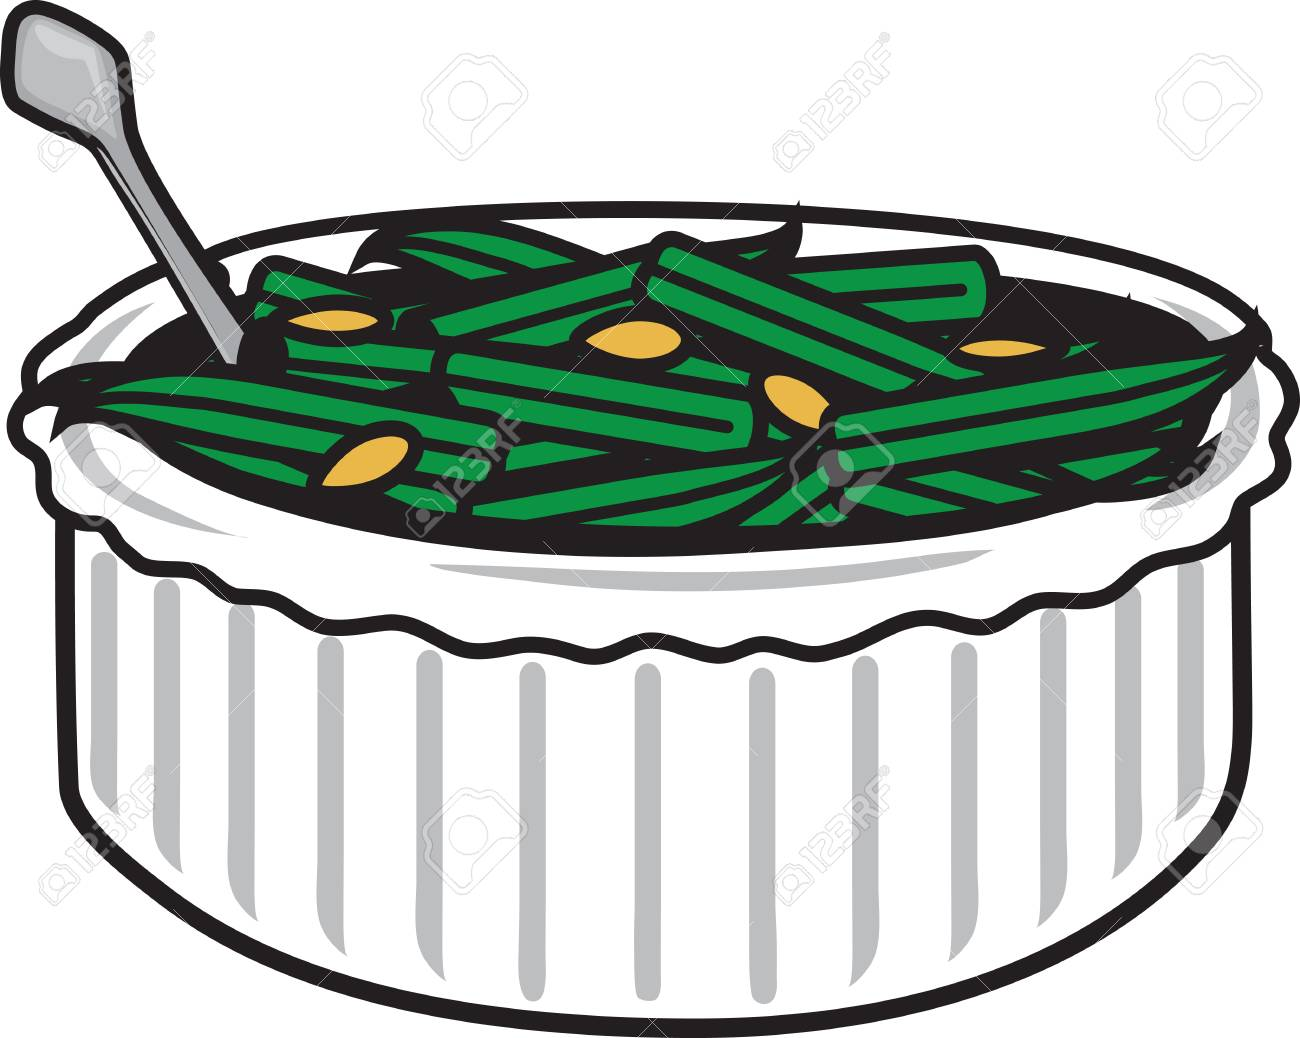 Vector illustration of a green bean casserole symbol.